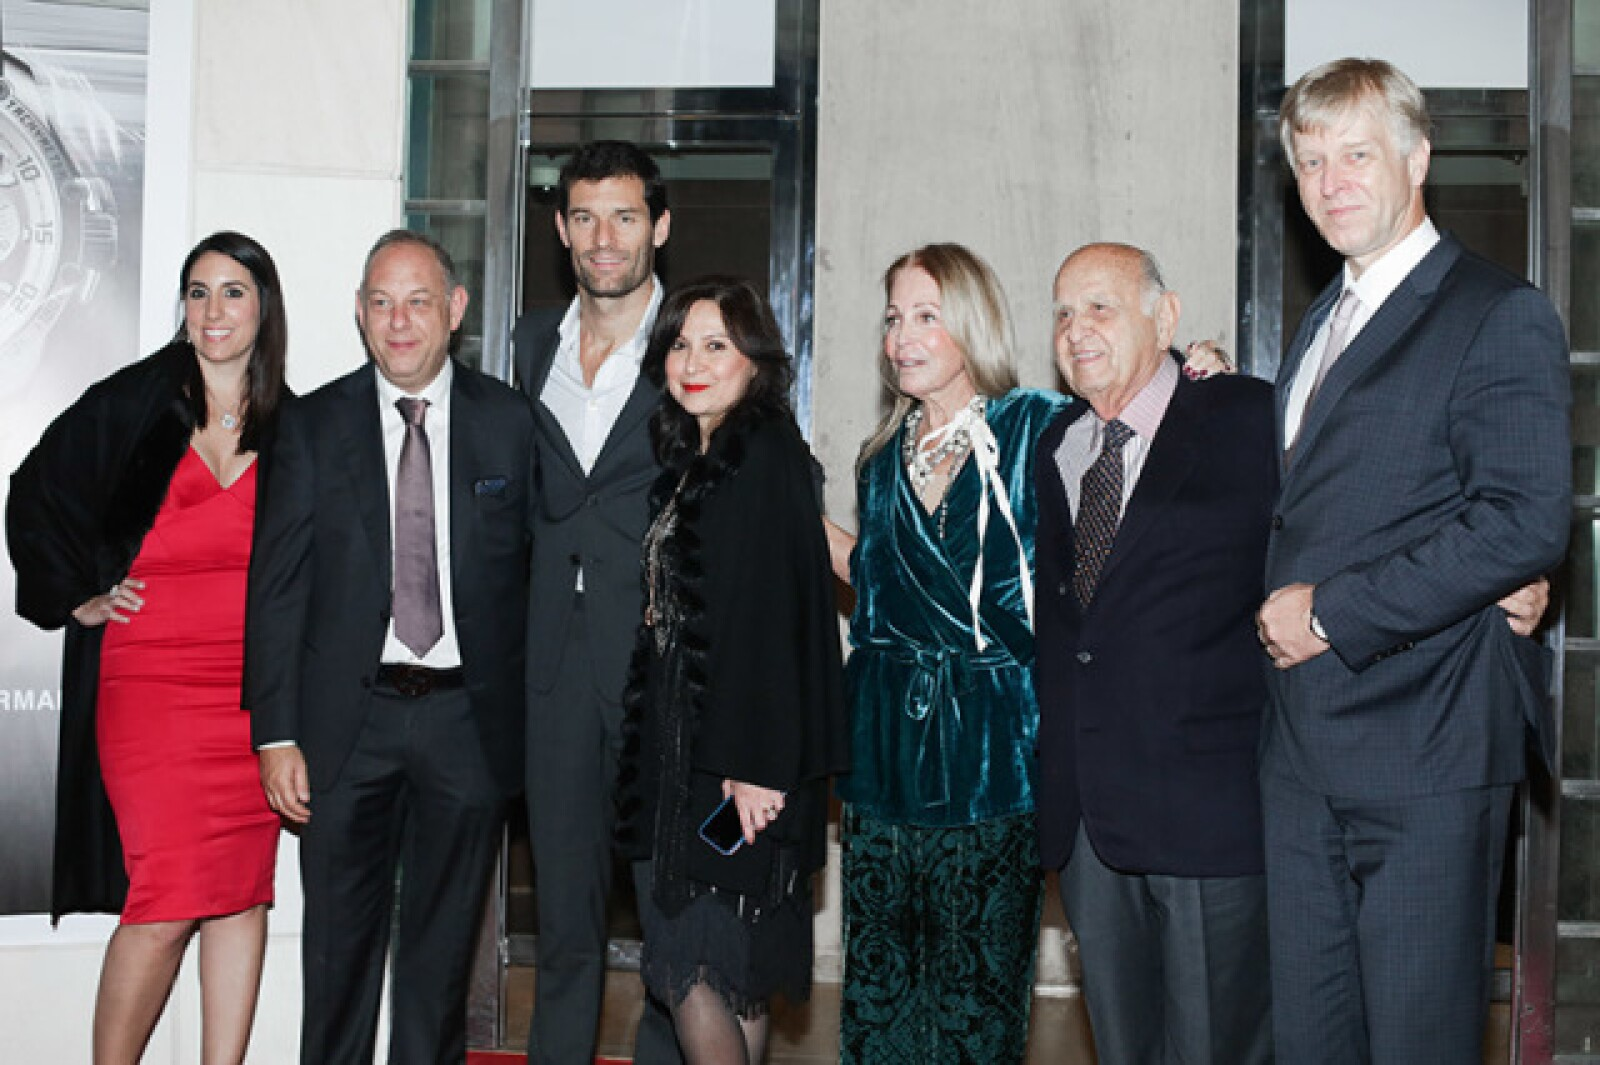 Alejandra Lorenzo,Ari Berger,Mark Webber,Ivonne Lebena,Barbara Berger,Mauricio Berger y Rudolph Lang